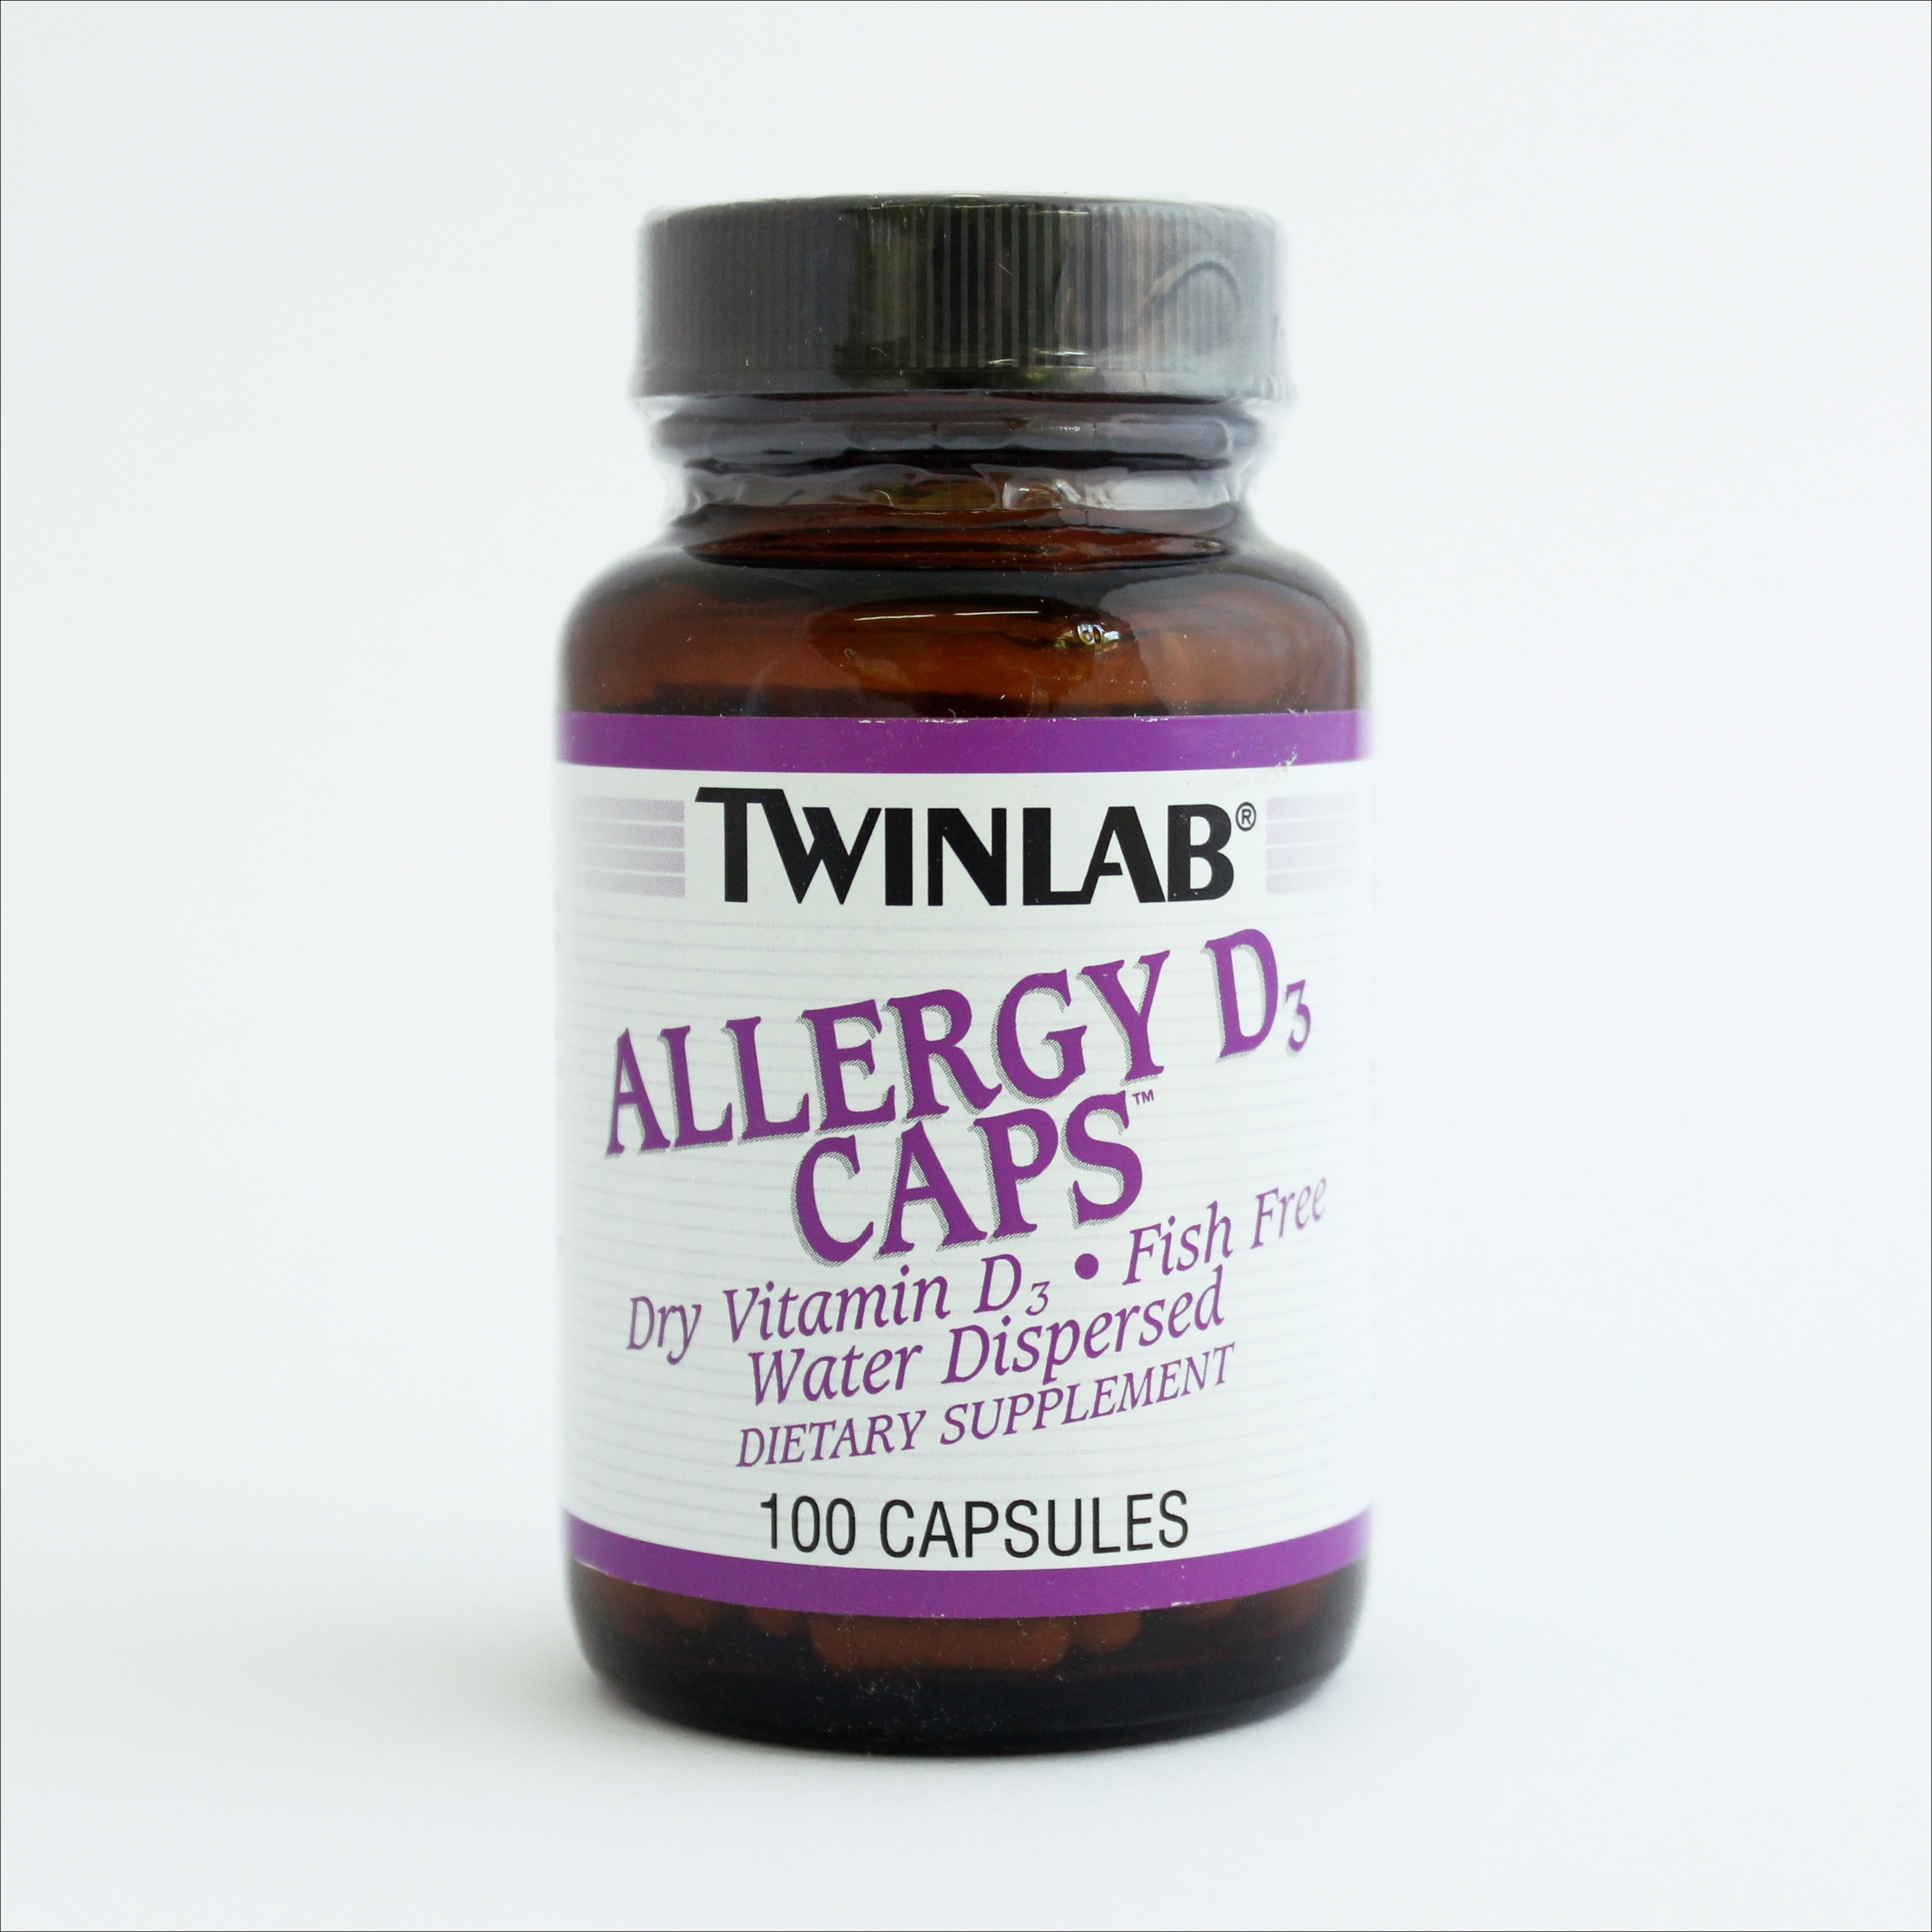 Twinlab Vitamin D kod alergija, 100 kapsula 00251